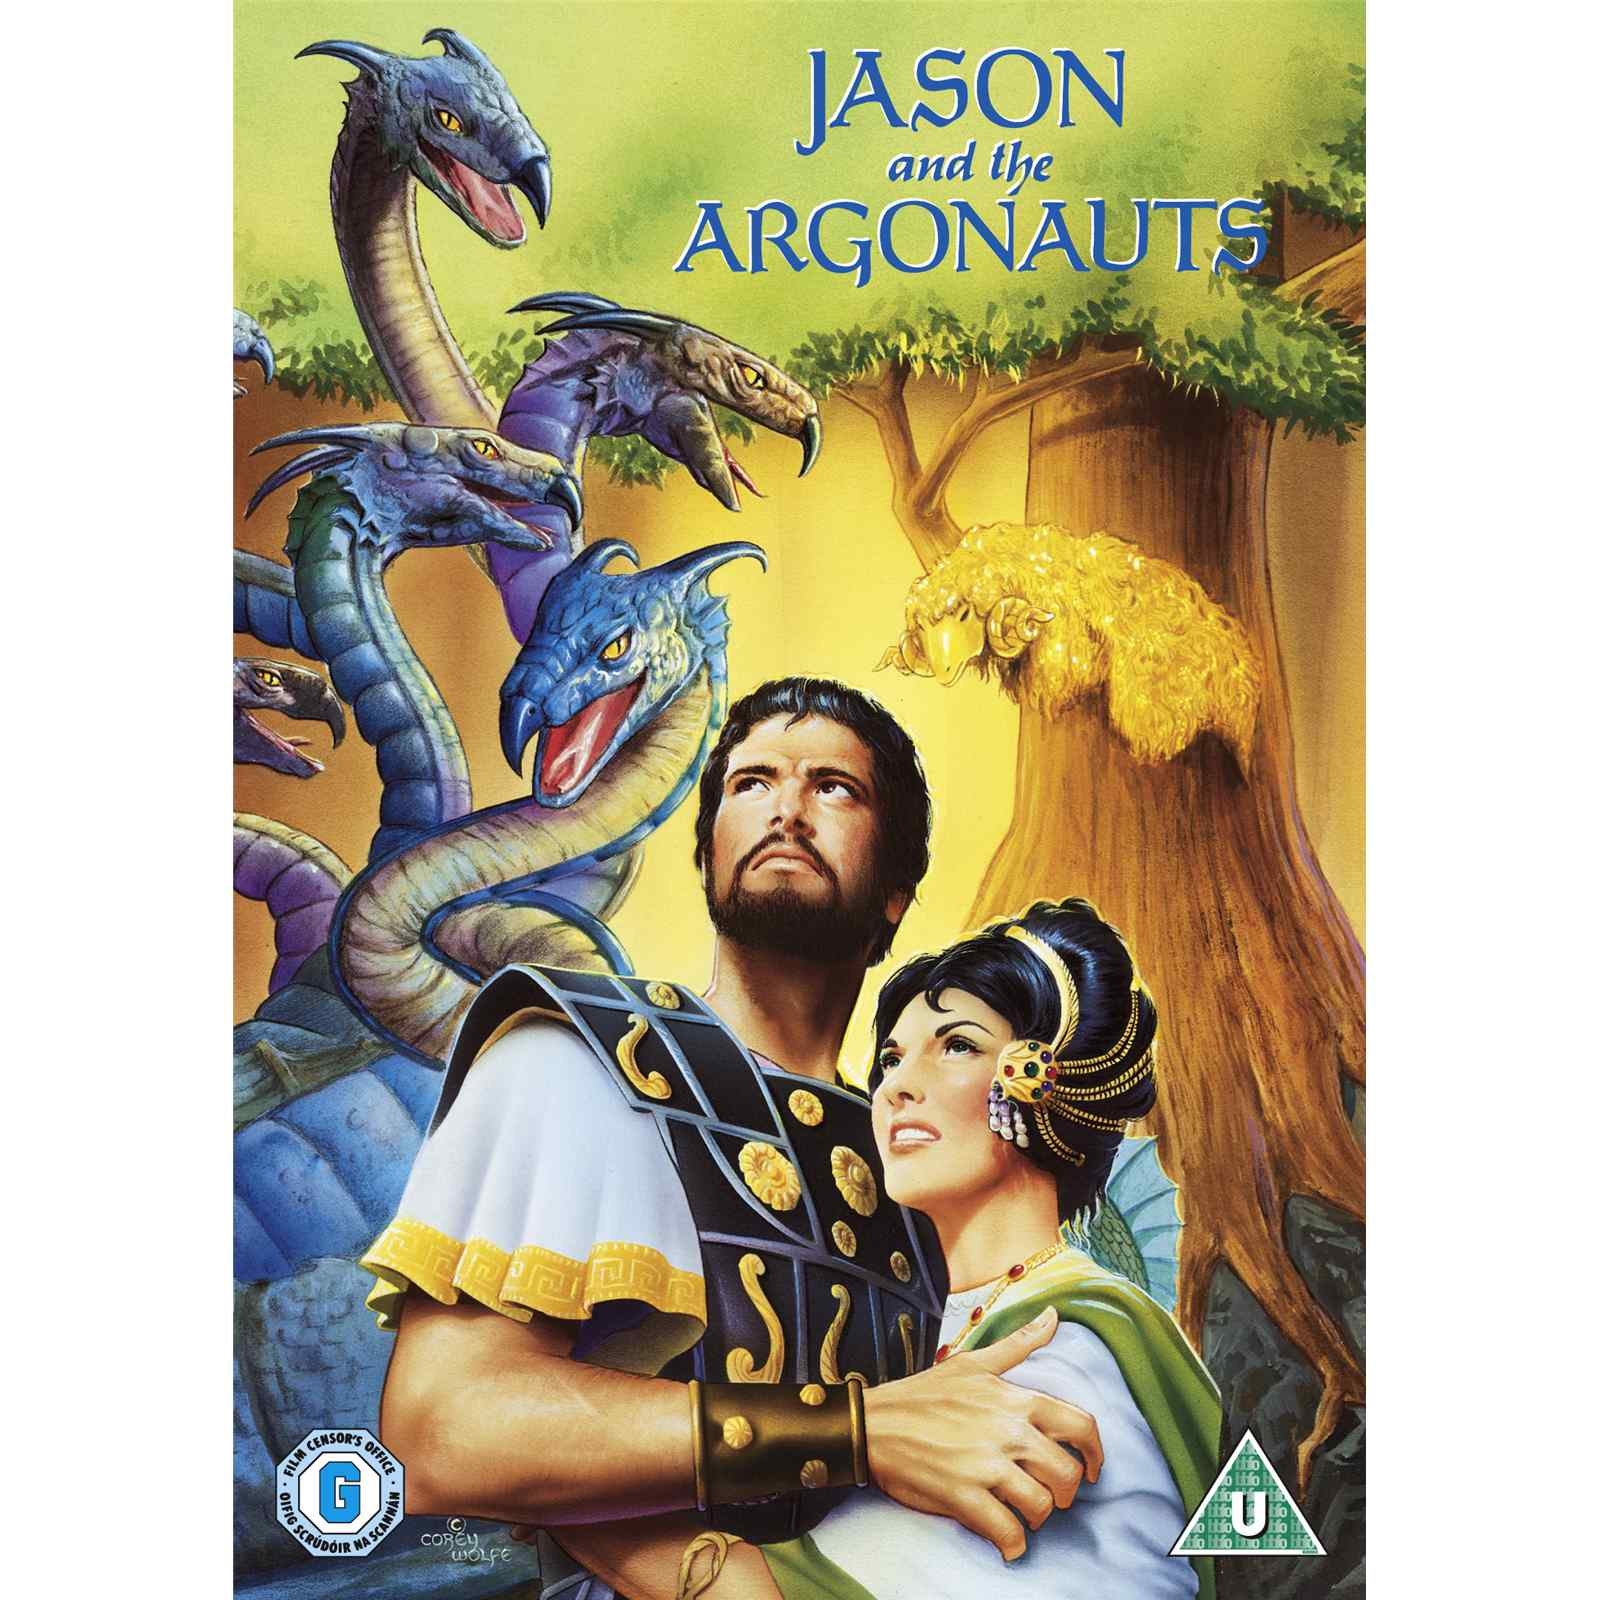 jason-and-the-argonauts-poster.jpg